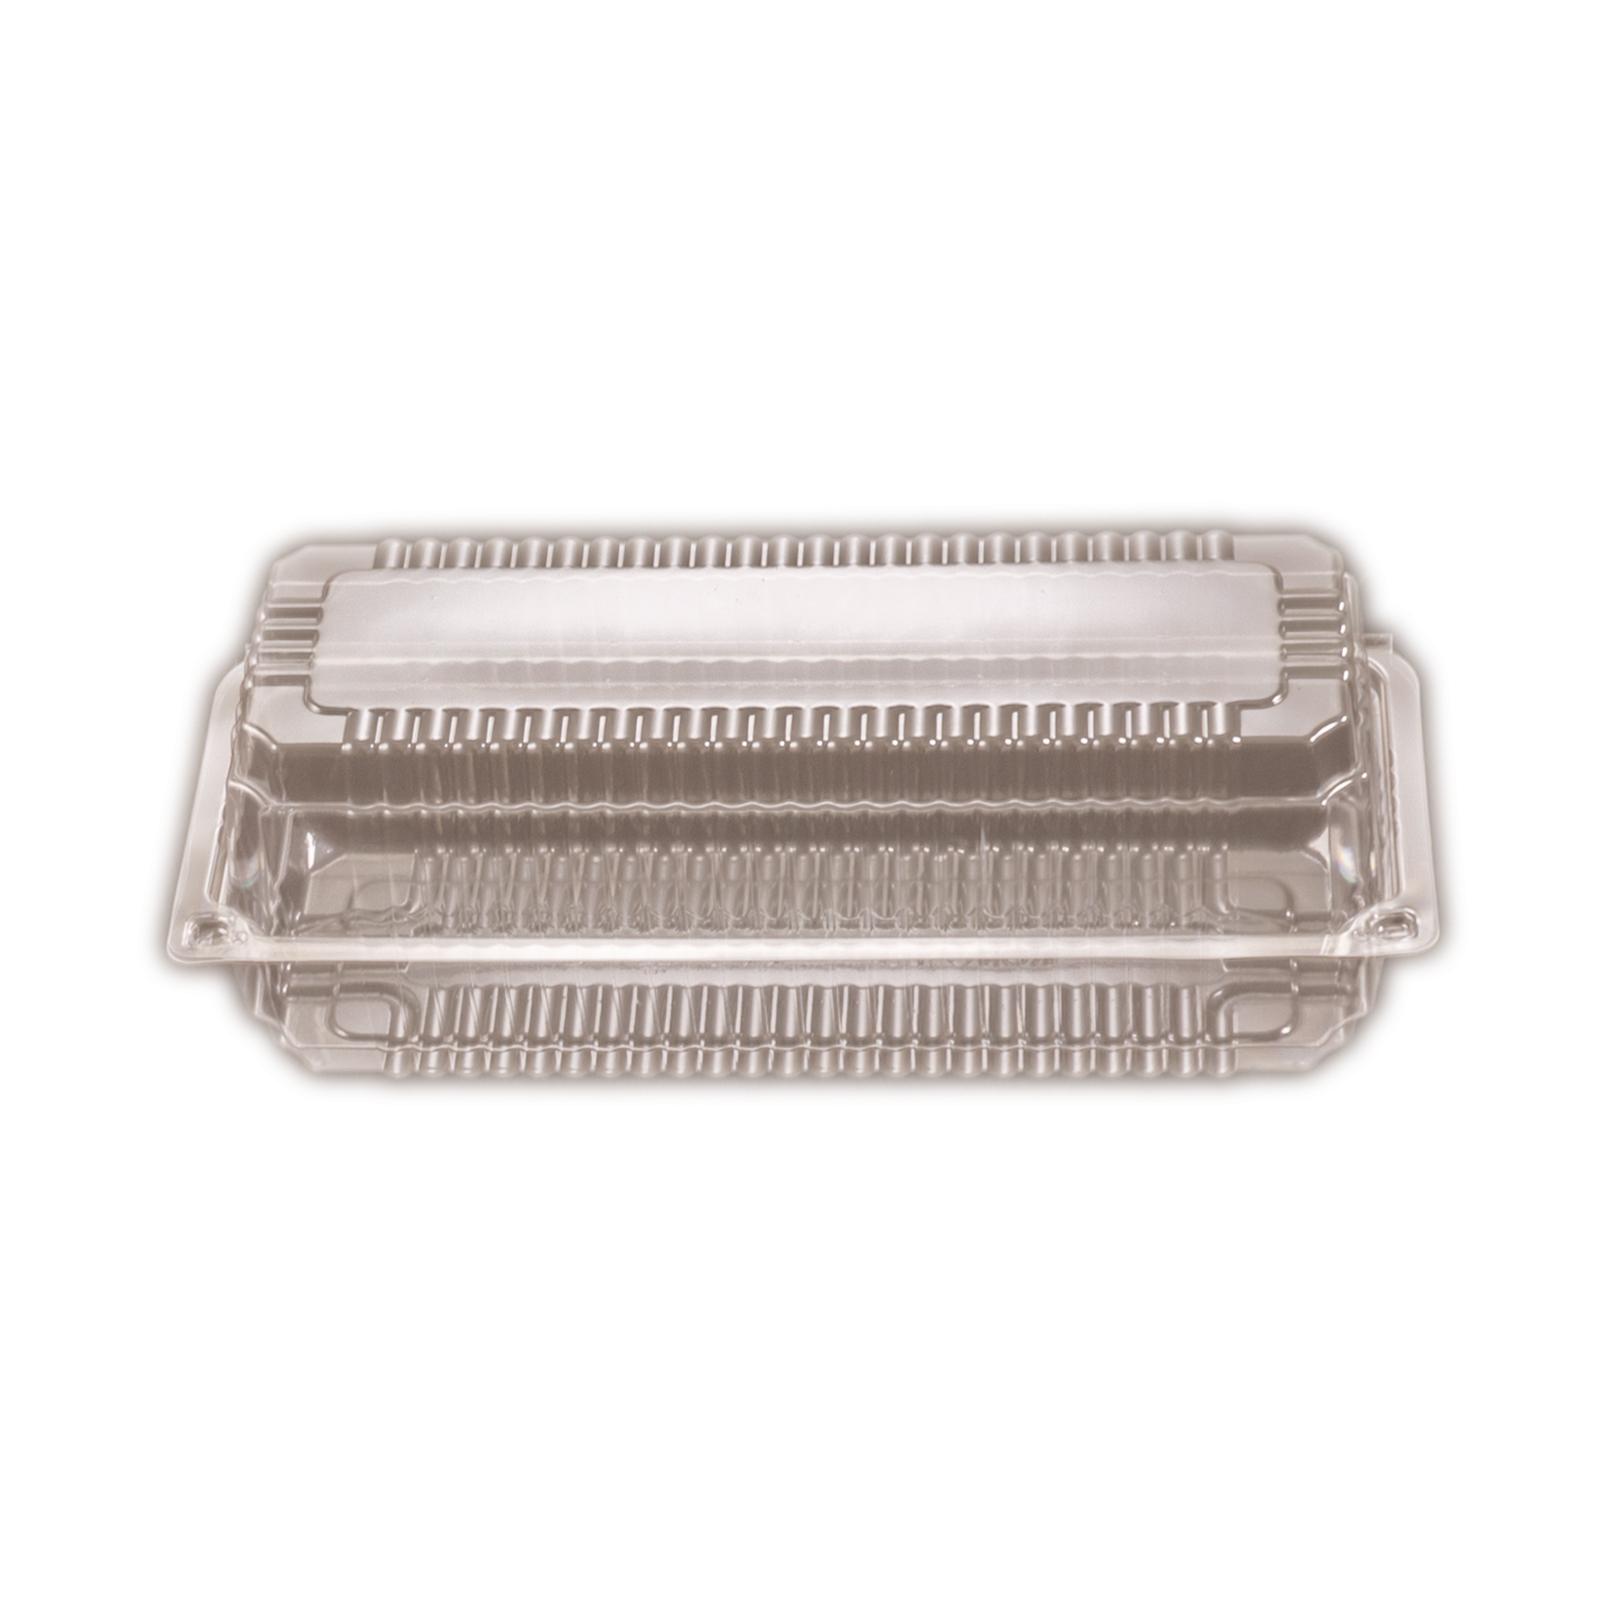 iK-RP2      LARGE ROLL PACK    190 x 240 x 44mm 100 per slv 400 per carton